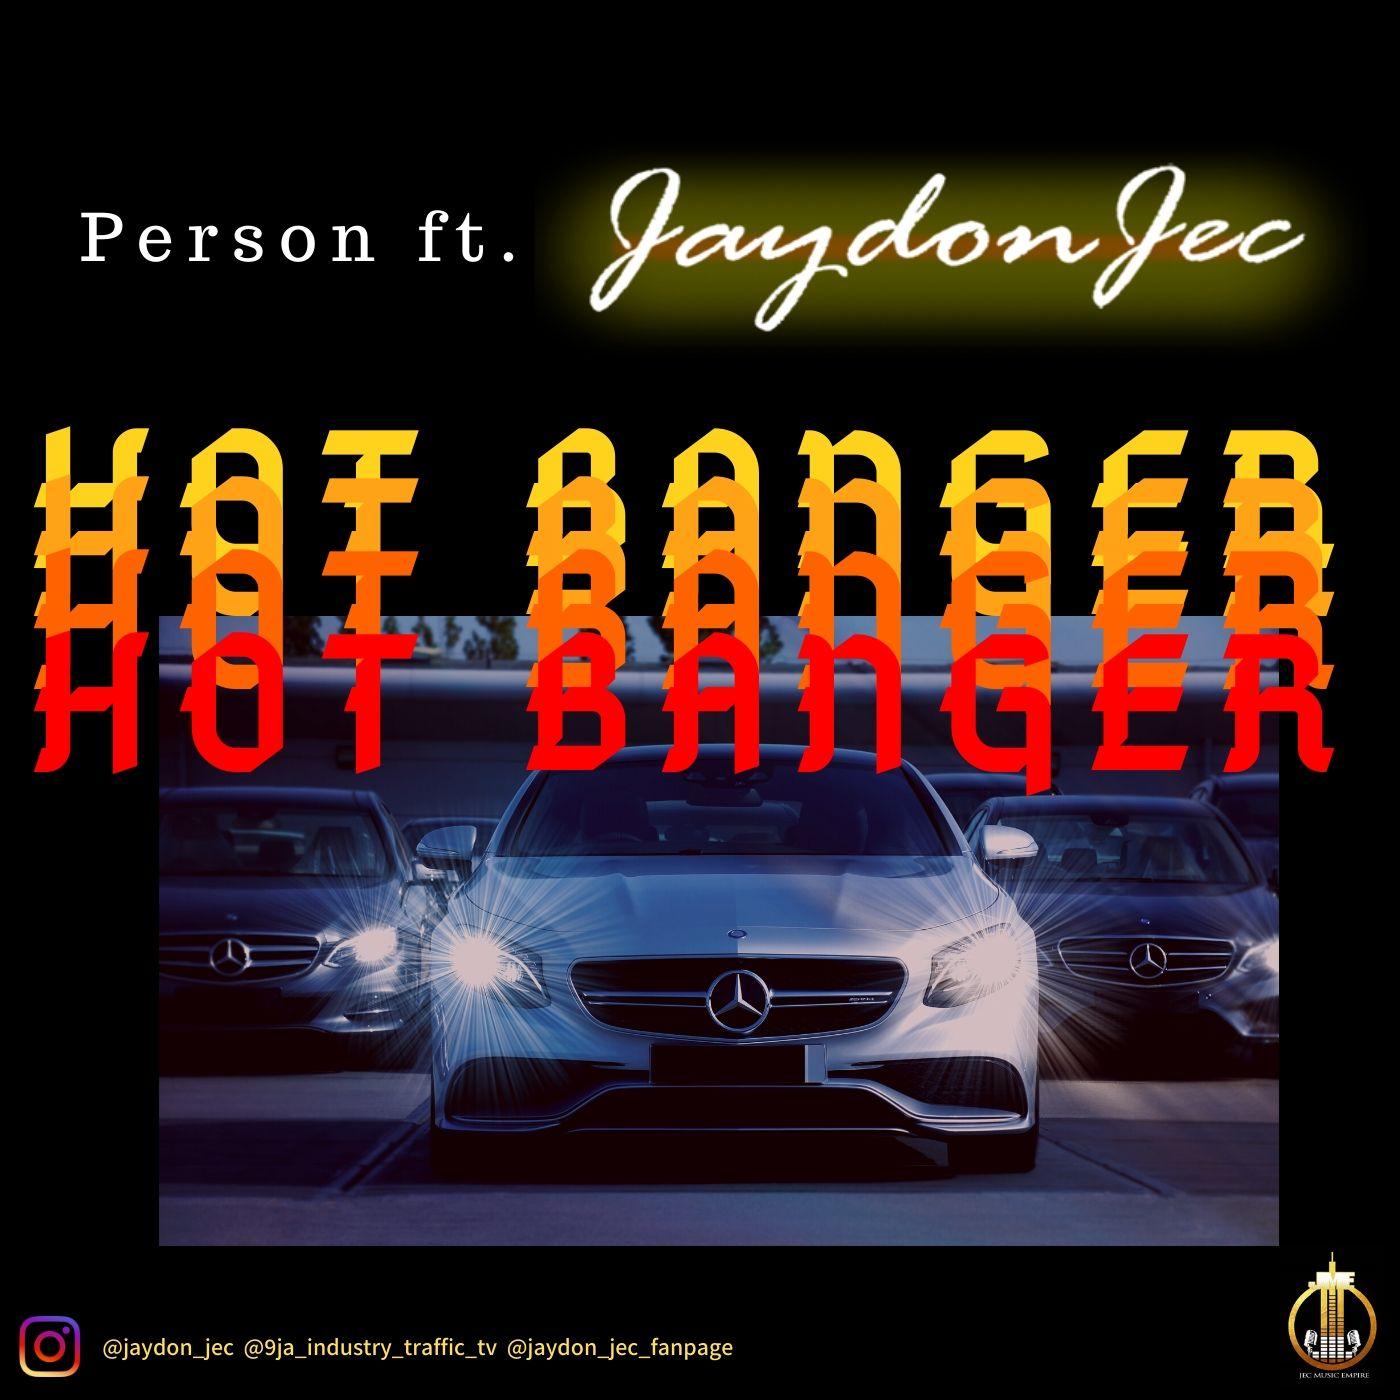 Hot Banger by Jaydon Jec